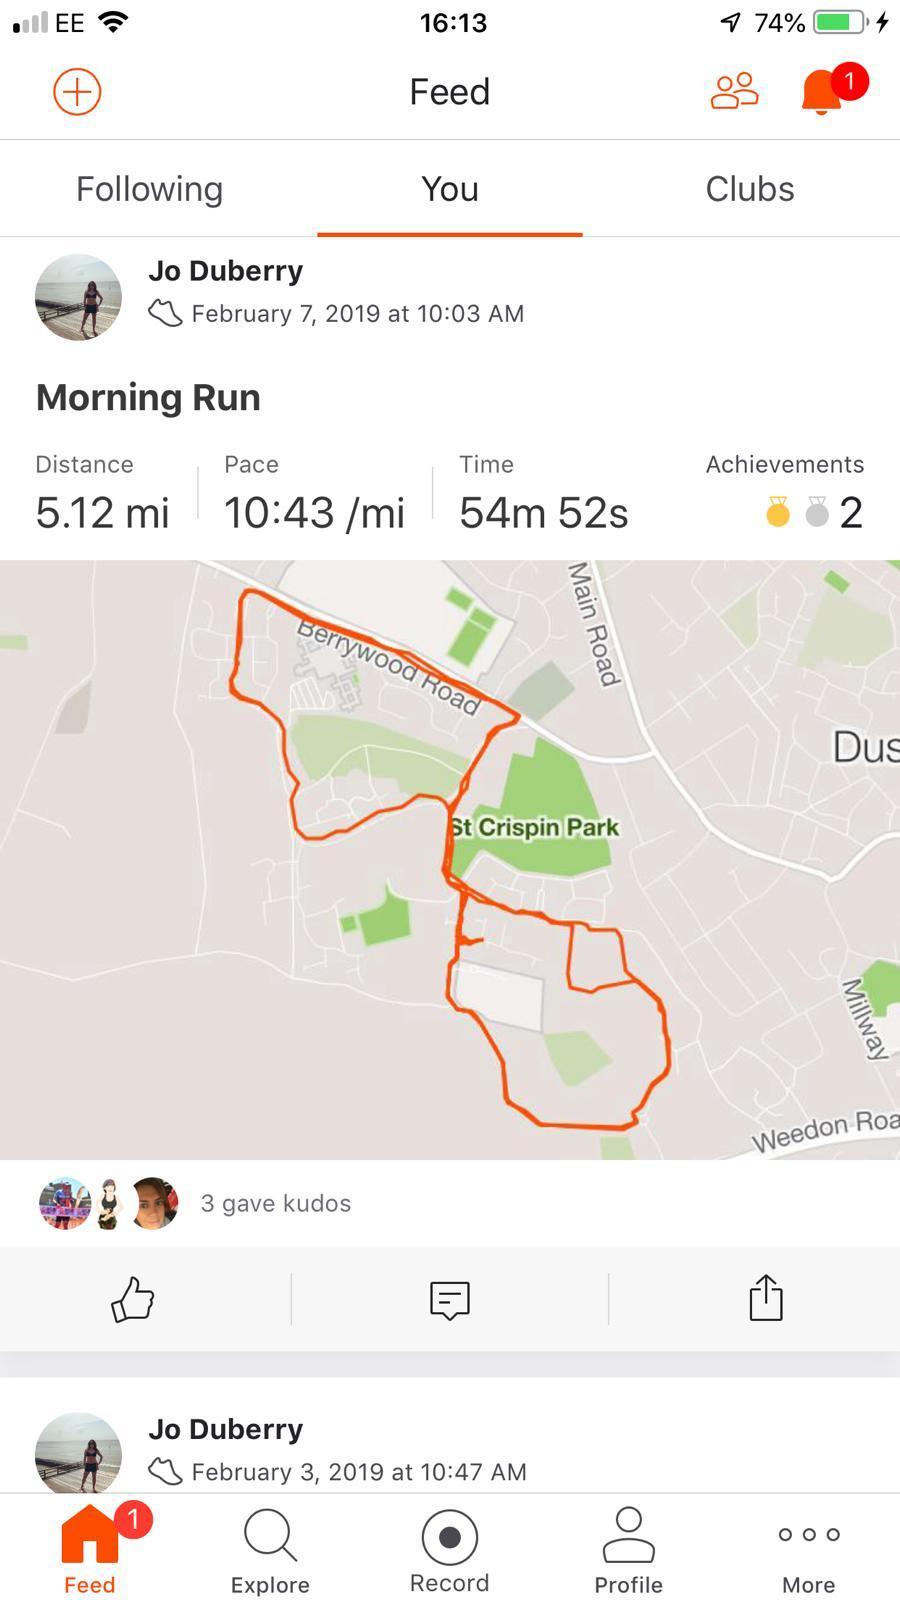 Jo Duberry Run in Northamptonshire